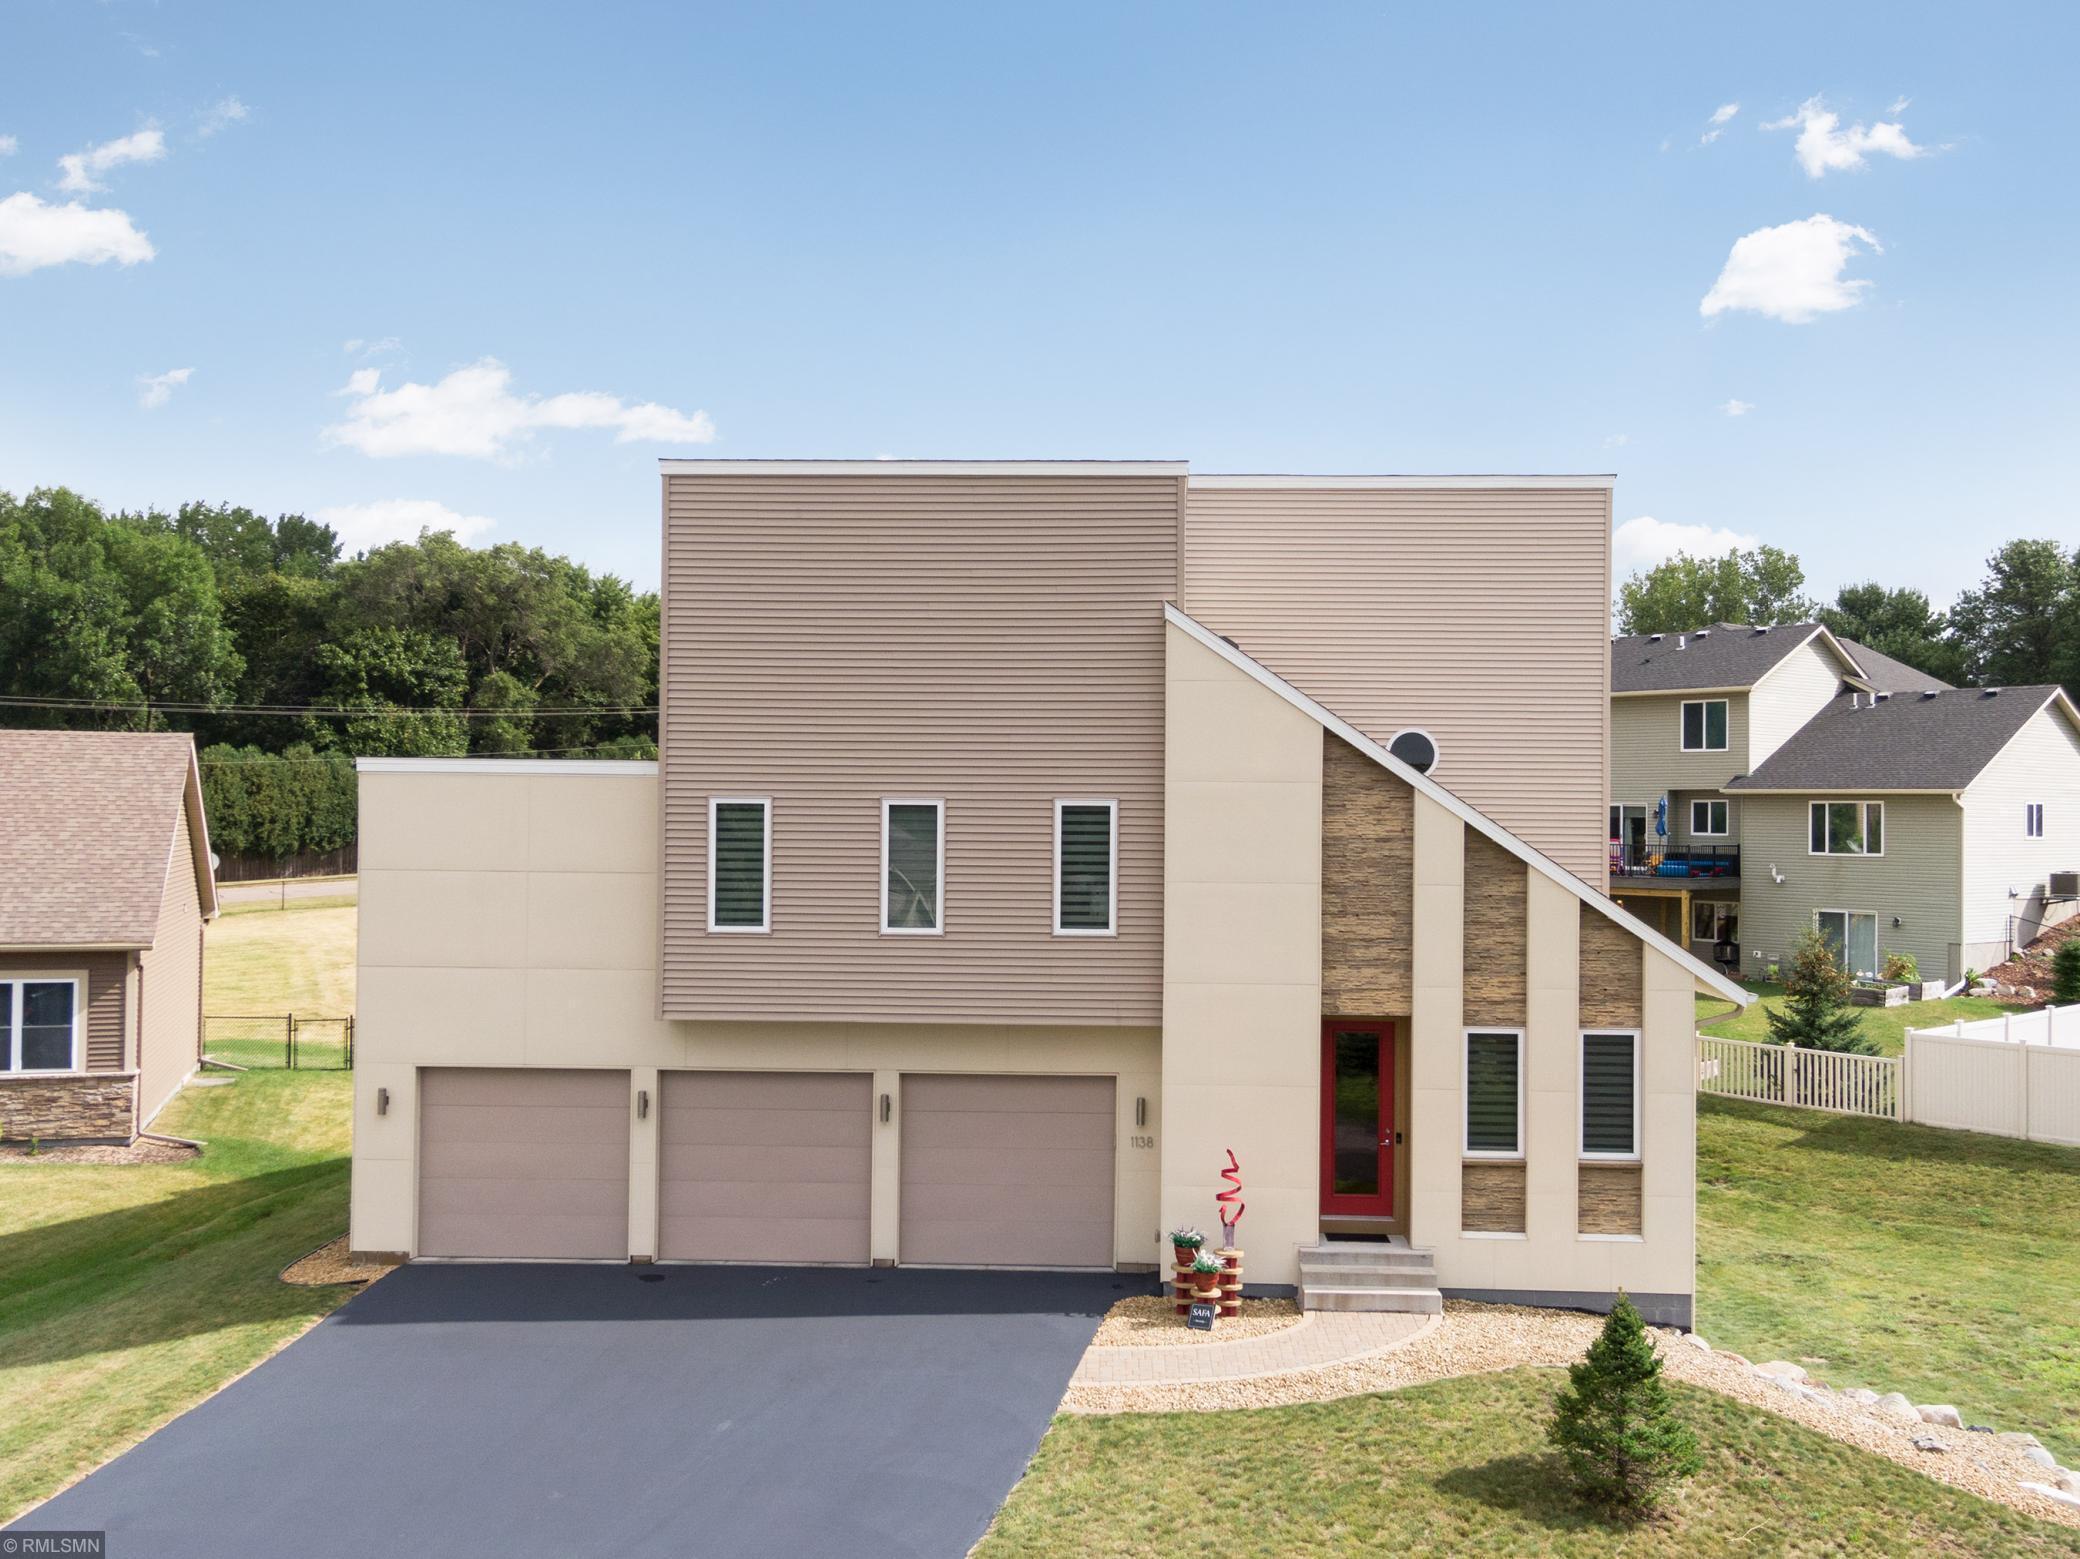 1138 Sunset Bay Property Photo - Woodbury, MN real estate listing